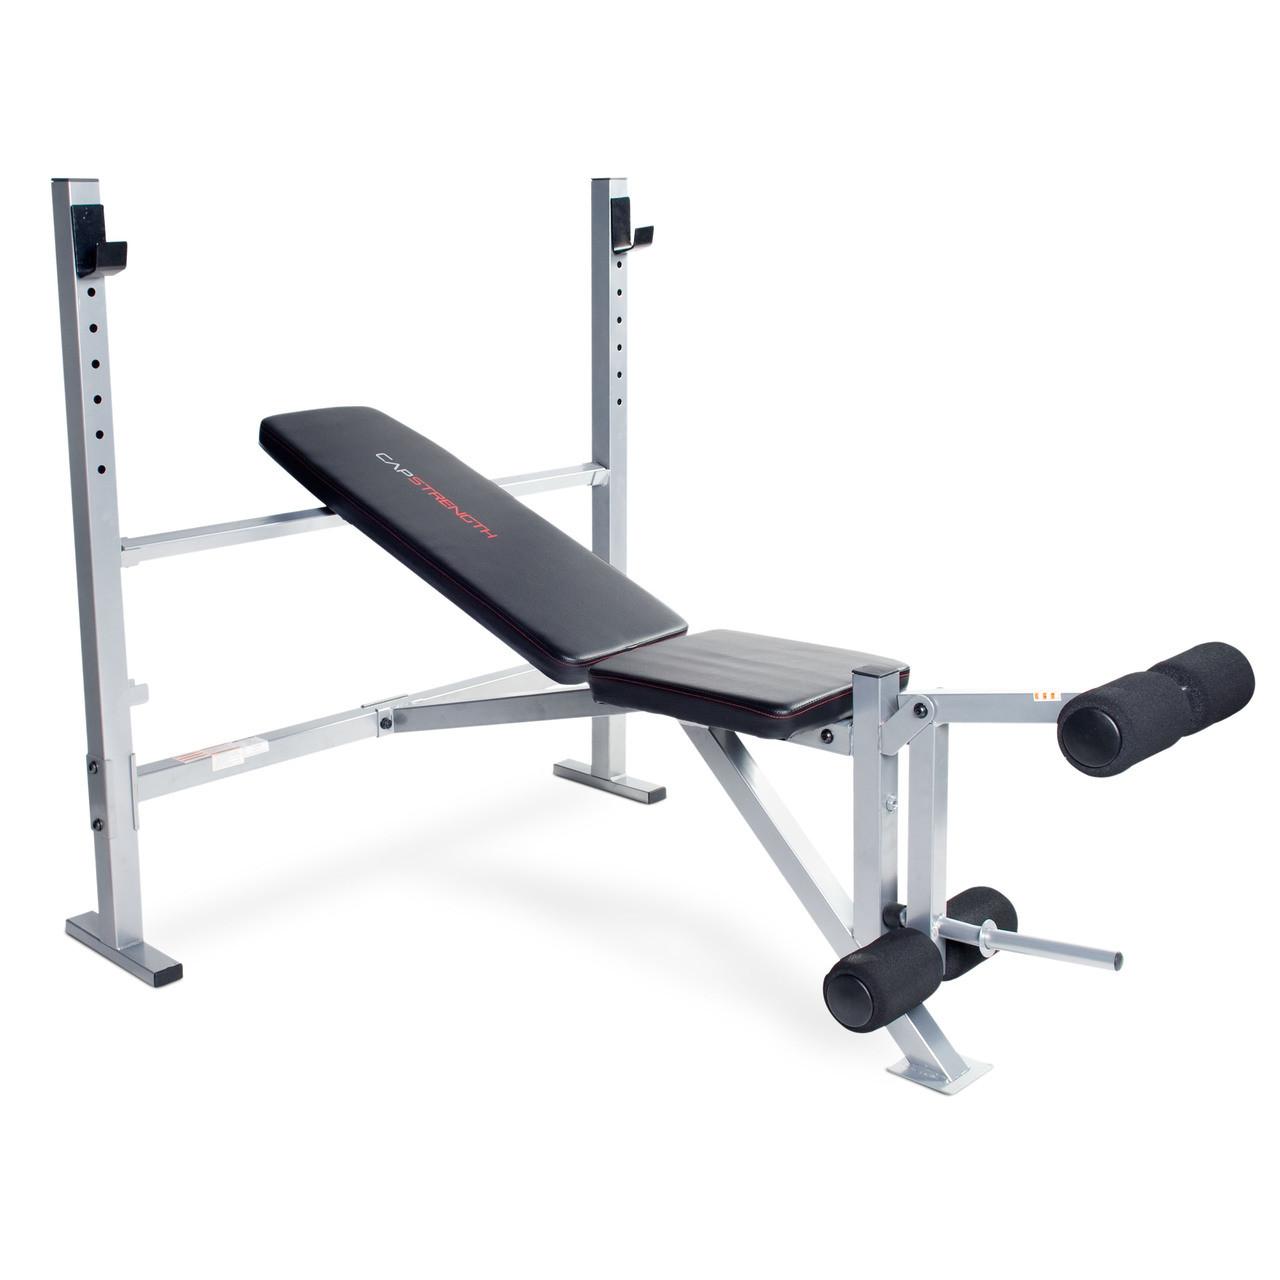 CAP Strength Olympic Bench with Leg Developer (FM-CS7100)